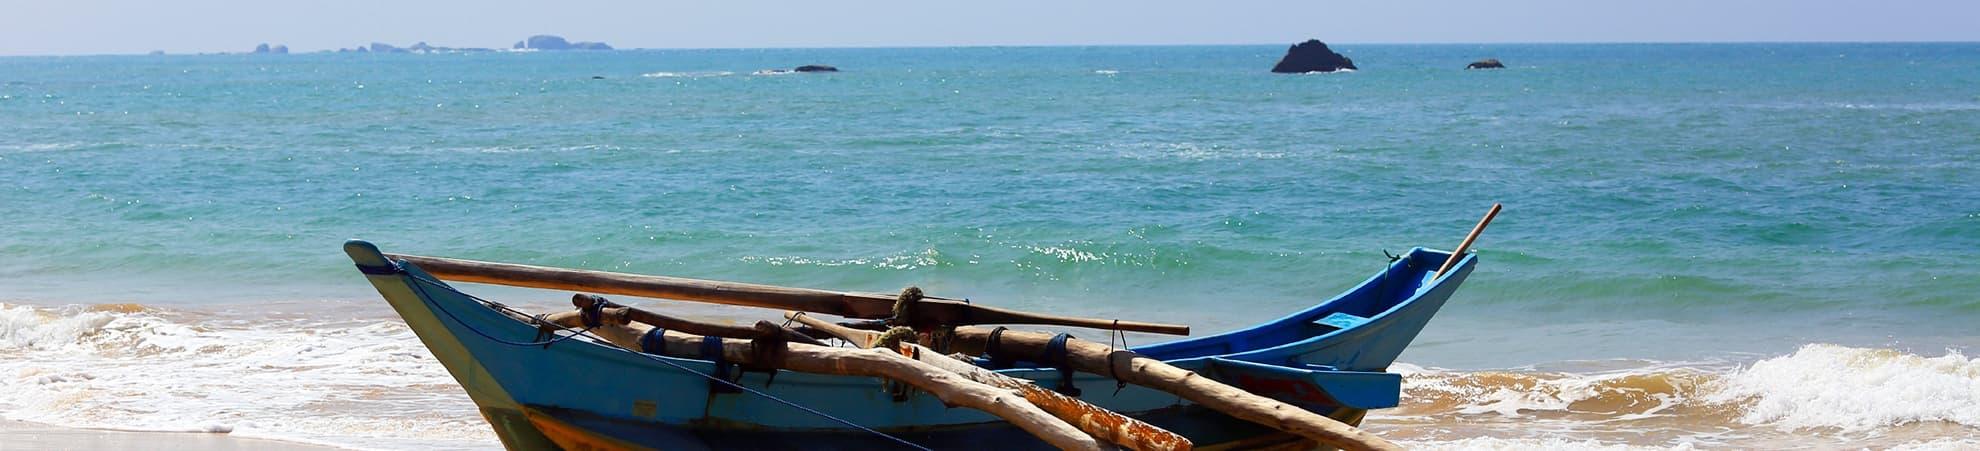 Voyage Trincomalee